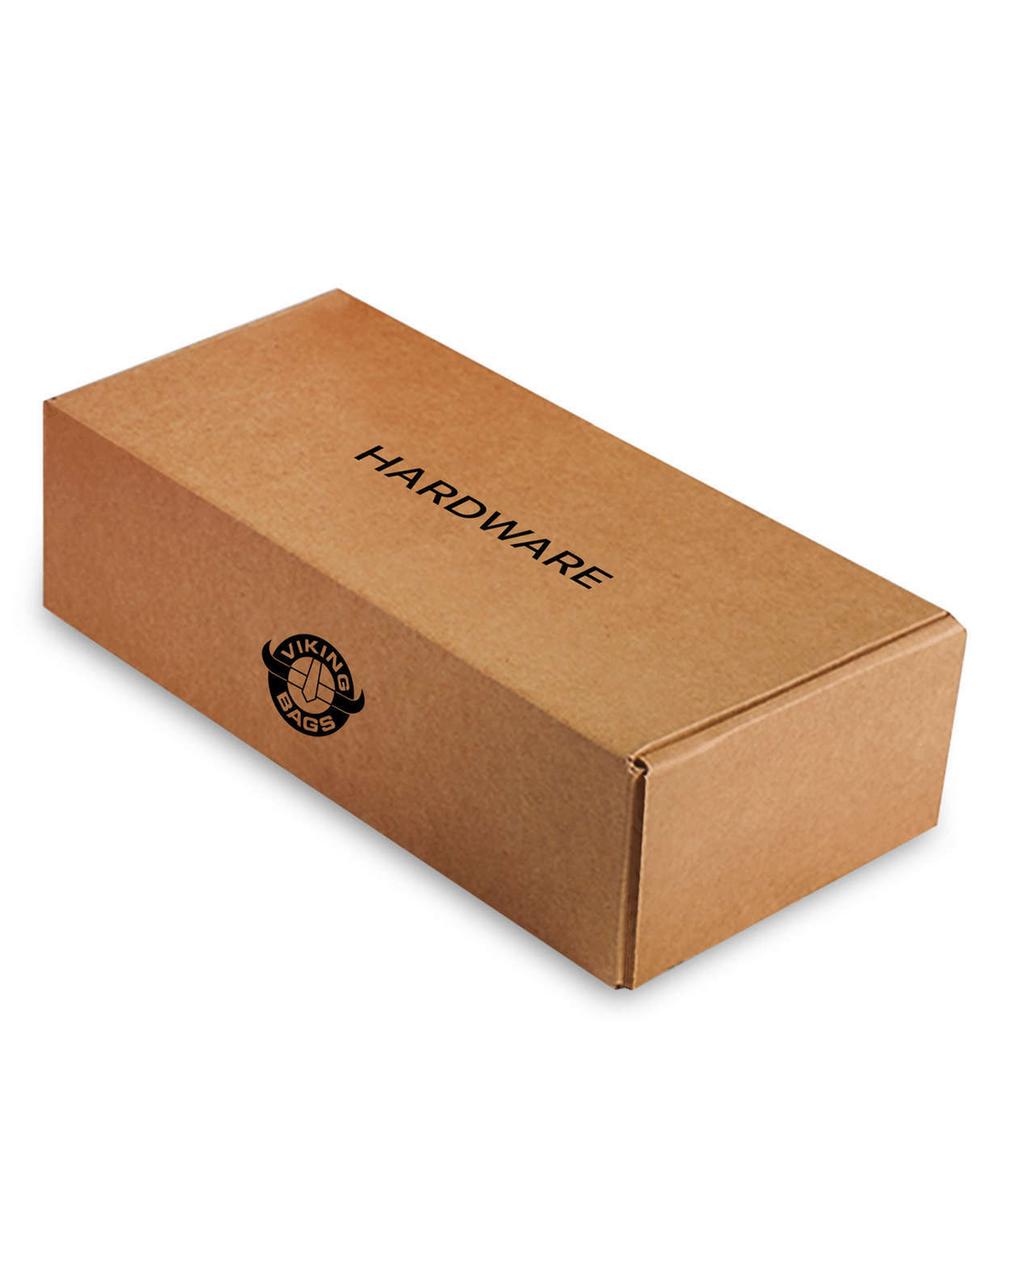 Honda CMX 250C Rebel 250 Slant Medium Motorcycle Saddlebags Hardware Box